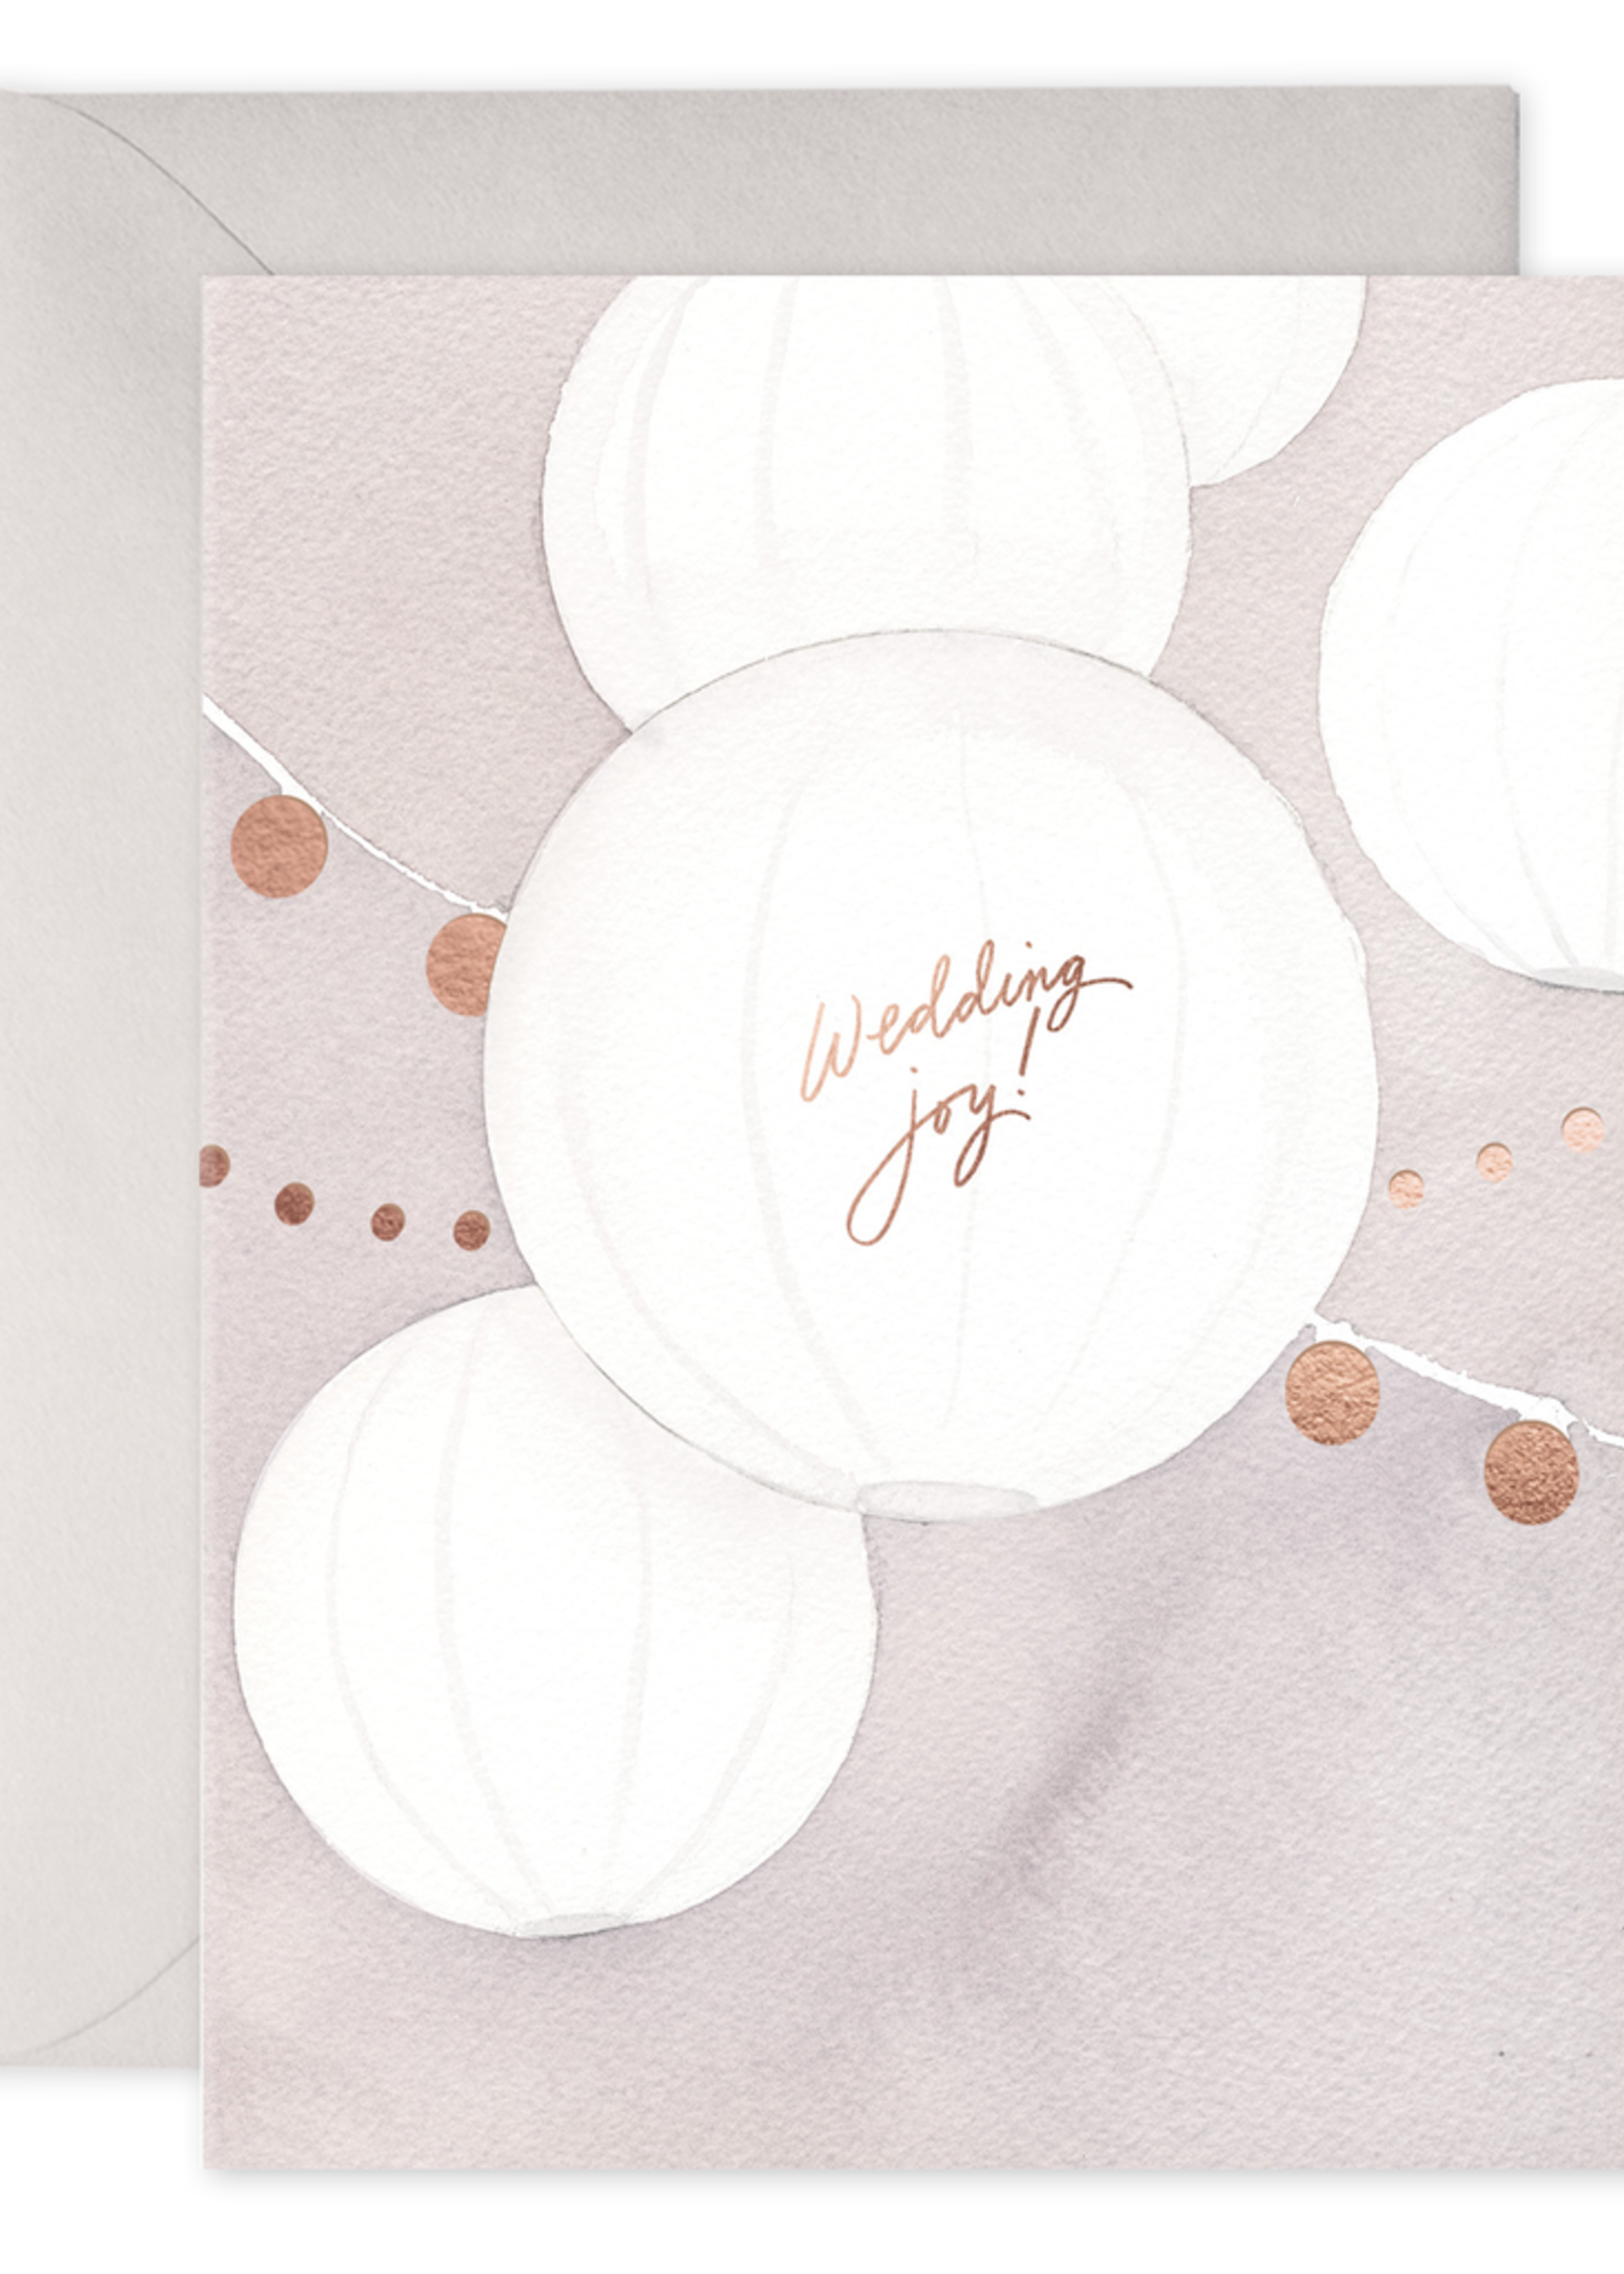 E. Frances Paper Wedding Card - Wedding Lanterns